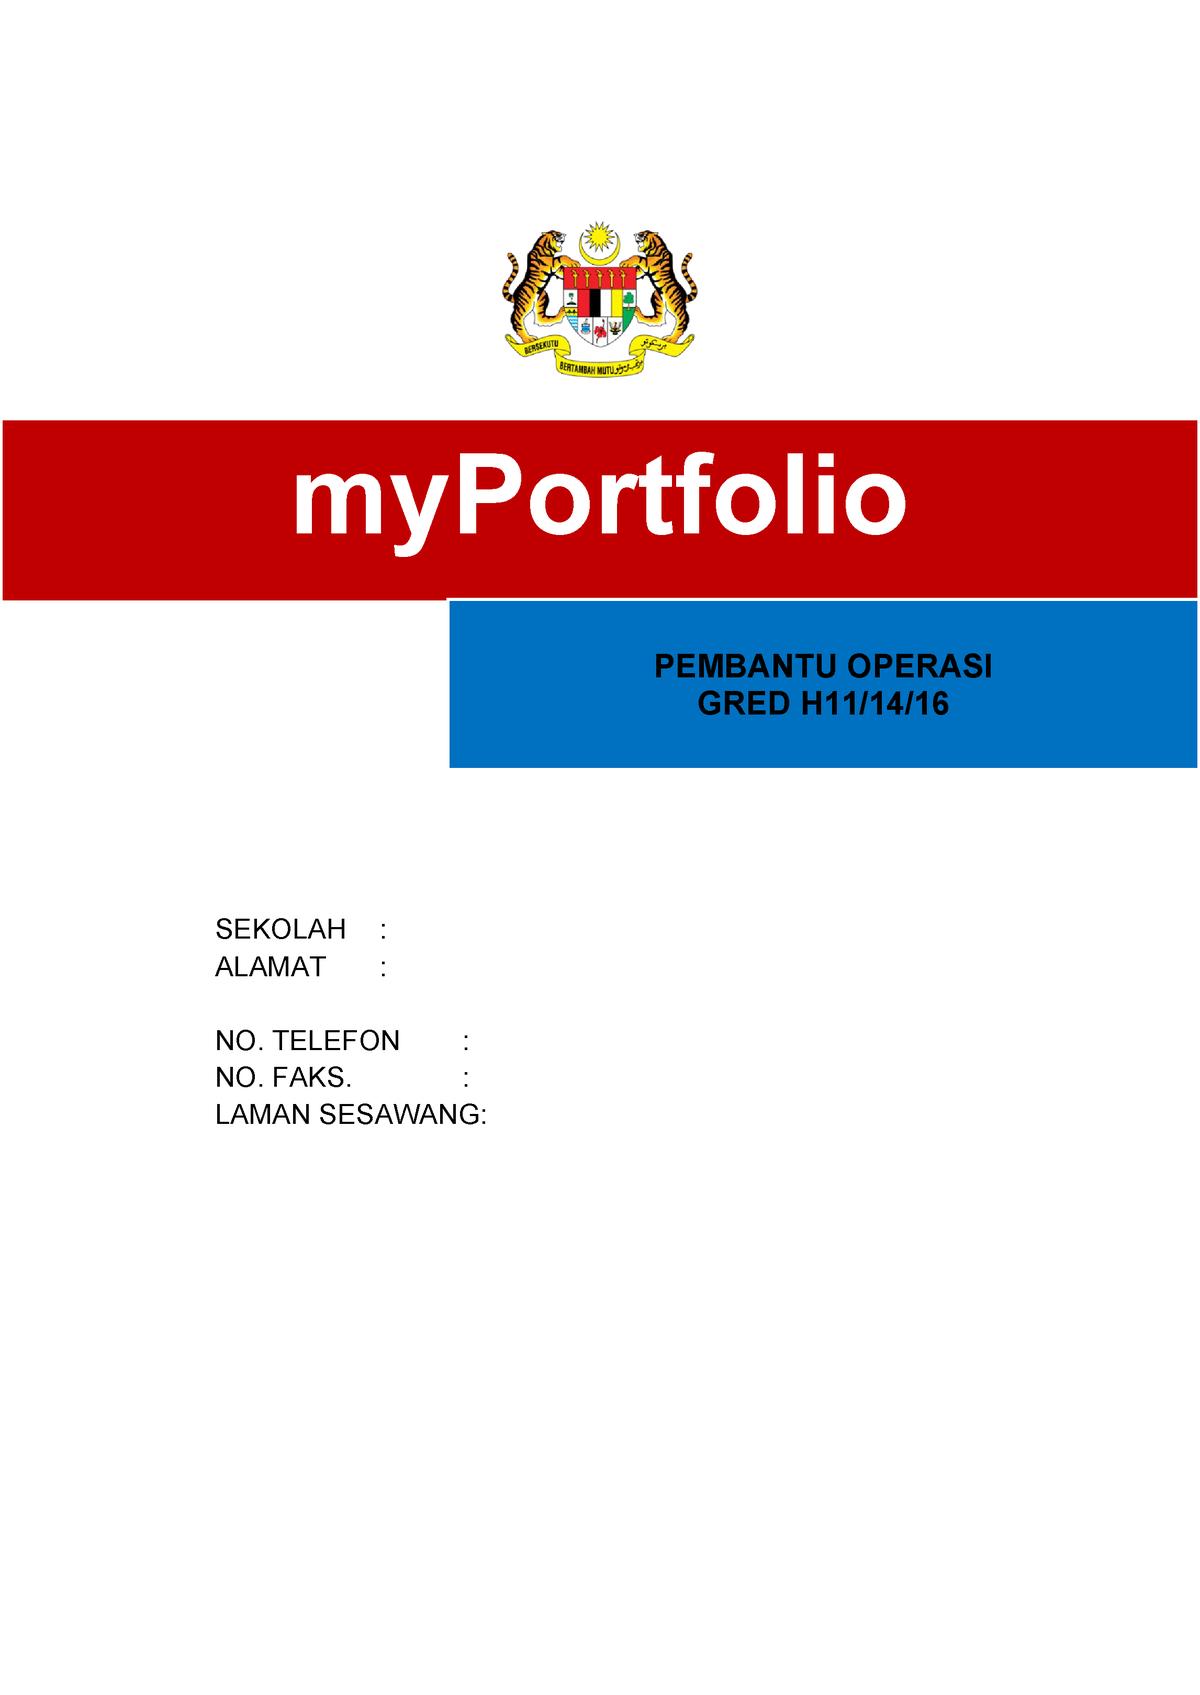 1 My Portfolio Pembantu Operasi Structure Analysis Studocu